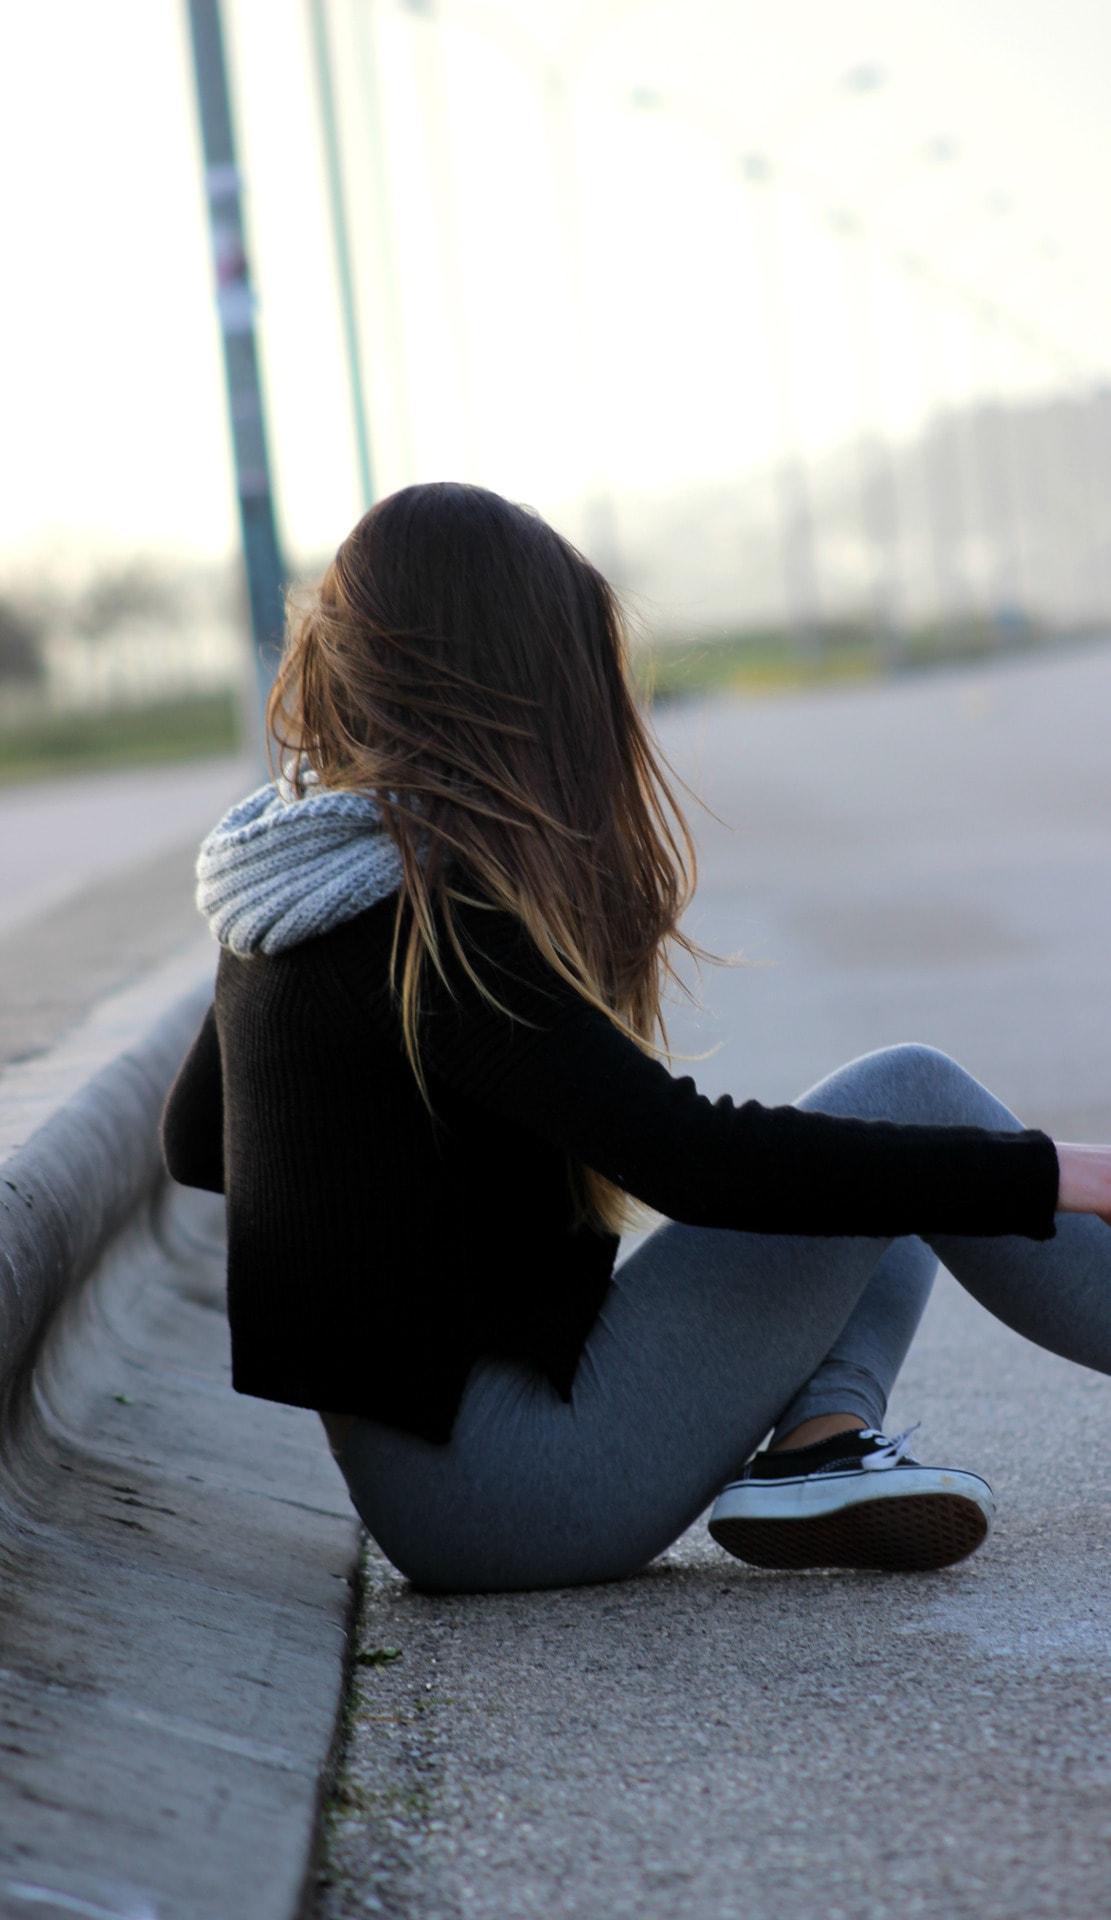 Картинки подростки без лица